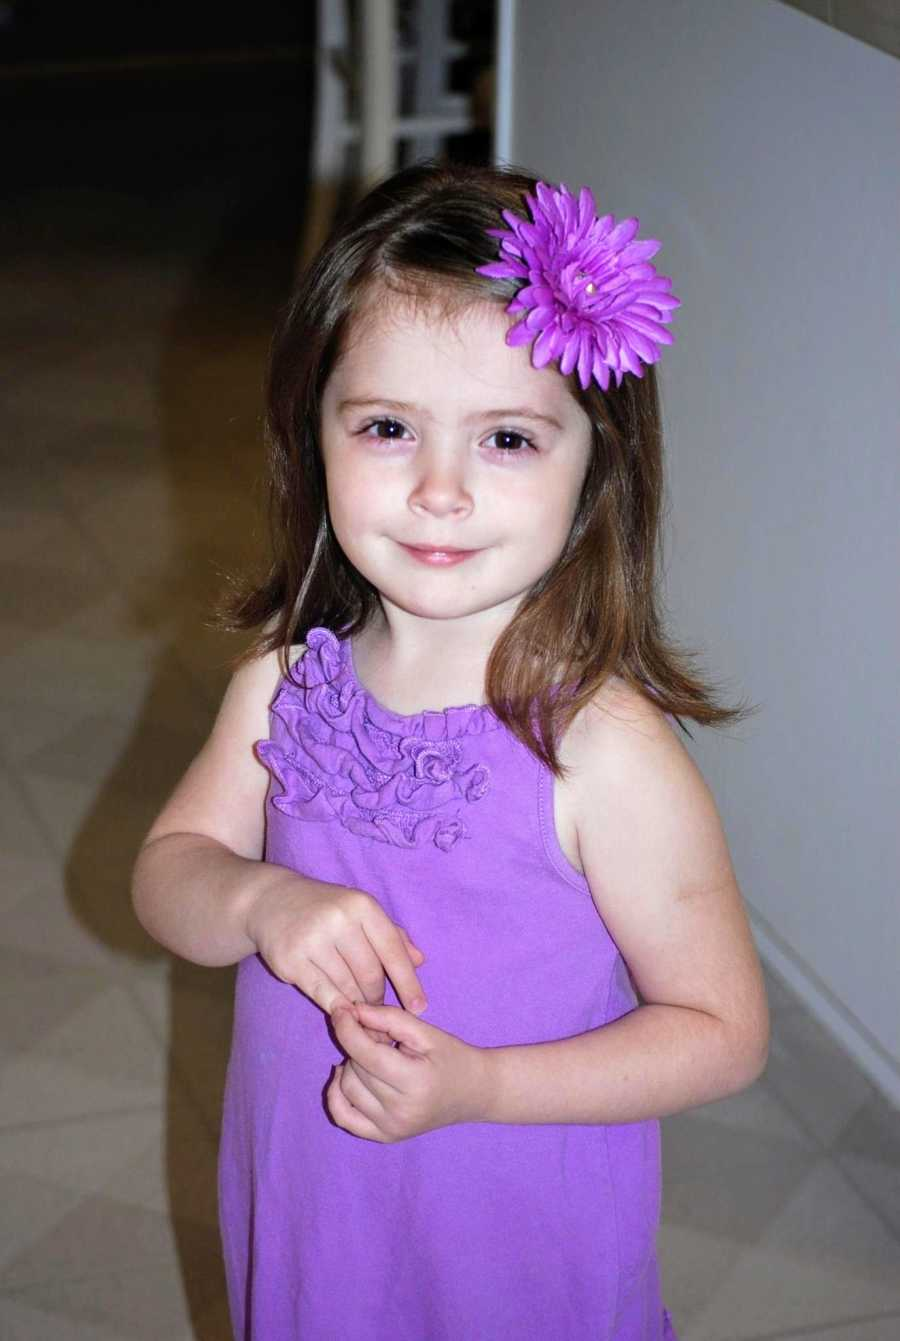 An adoptive girl wearing a purple dress